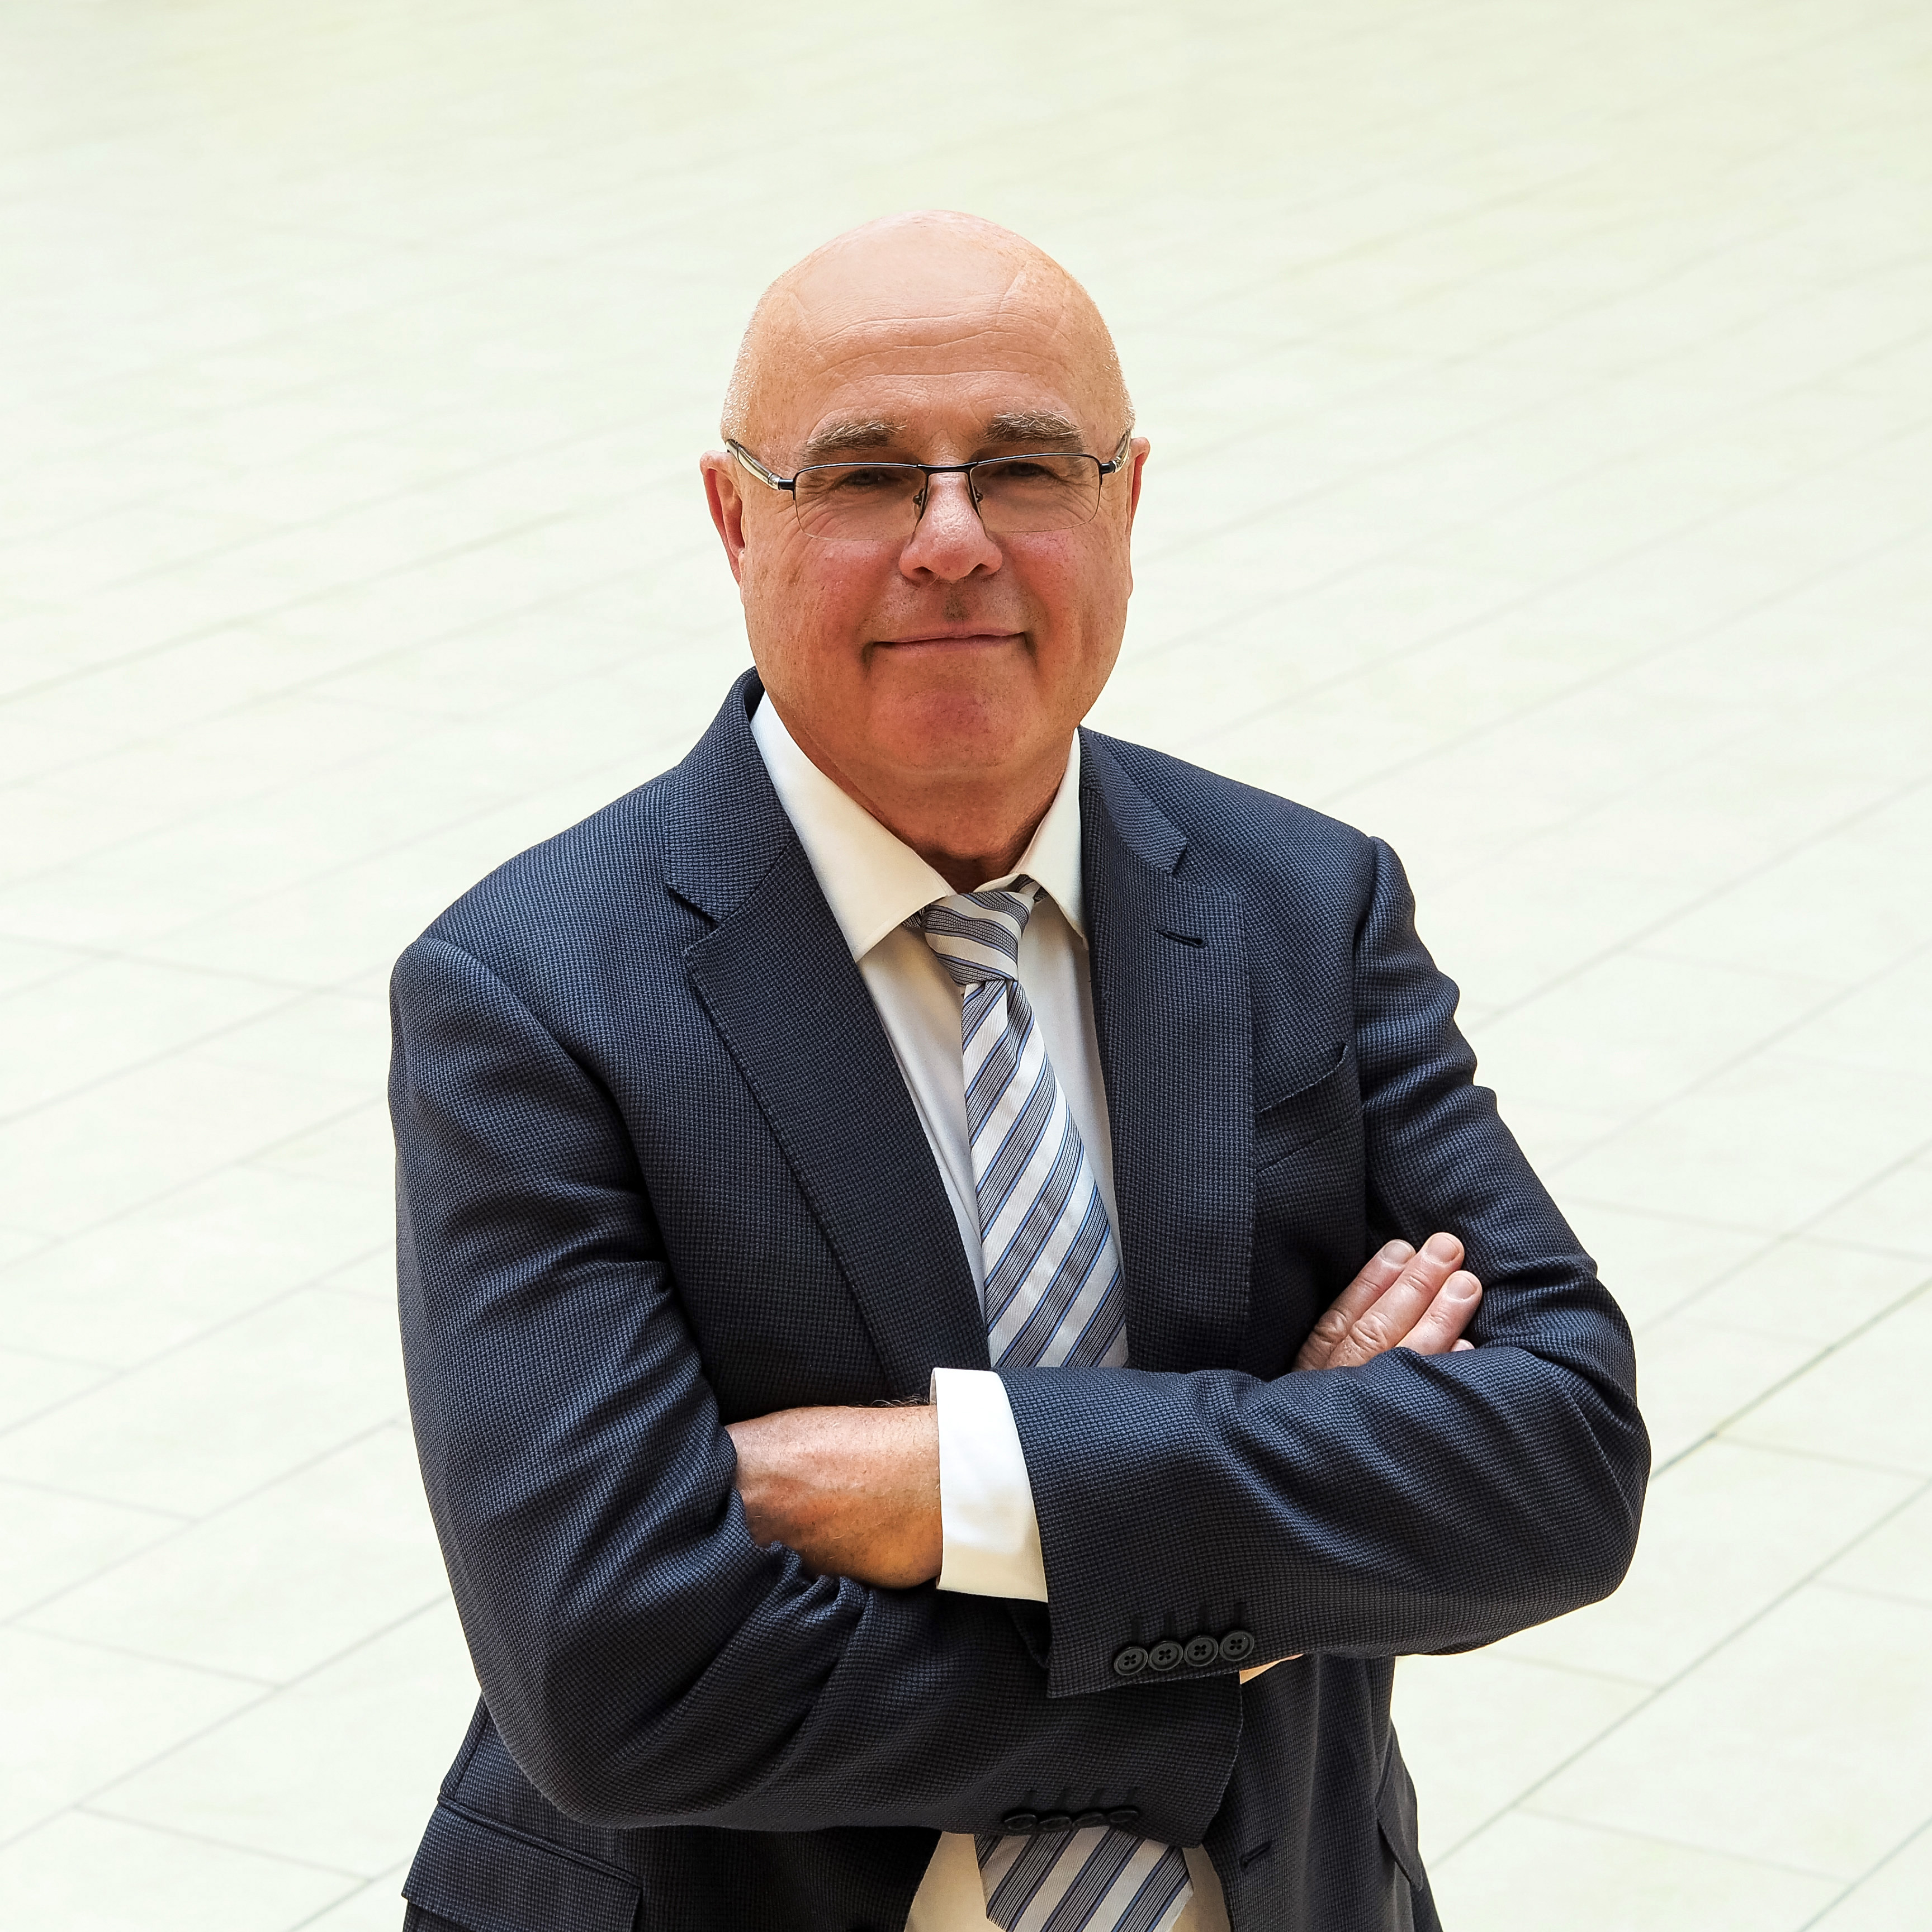 Steve Cockcroft